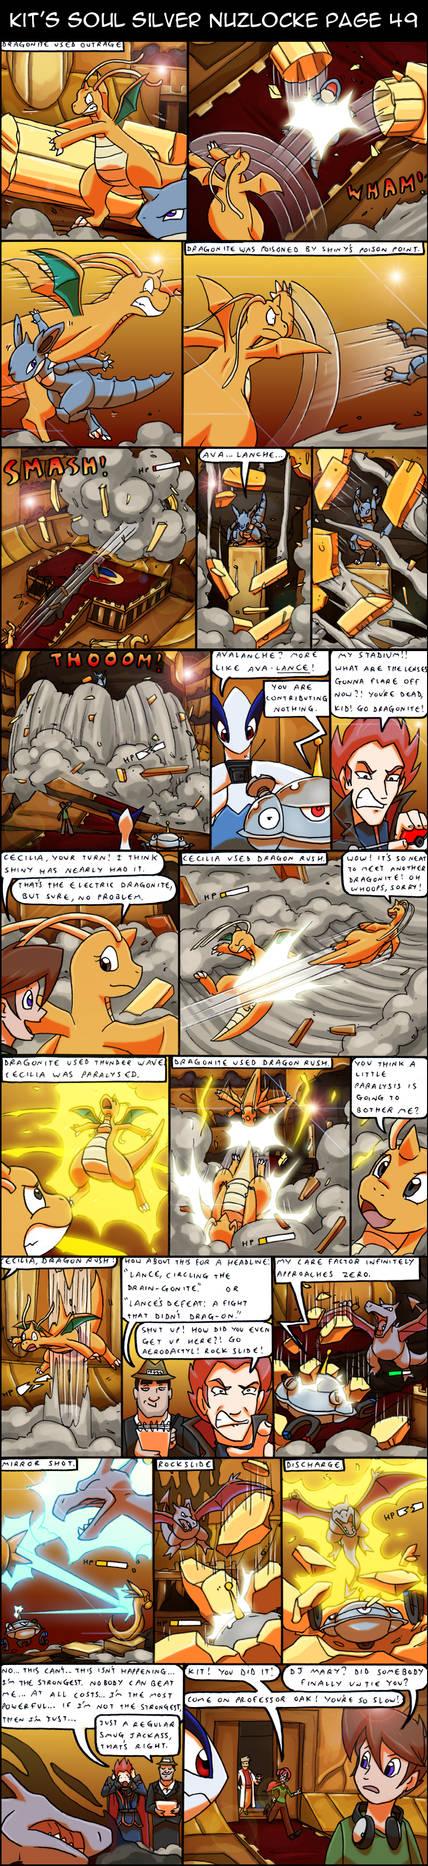 Kit's Soul Silver Nuzlocke page 49 by kitfox-crimson